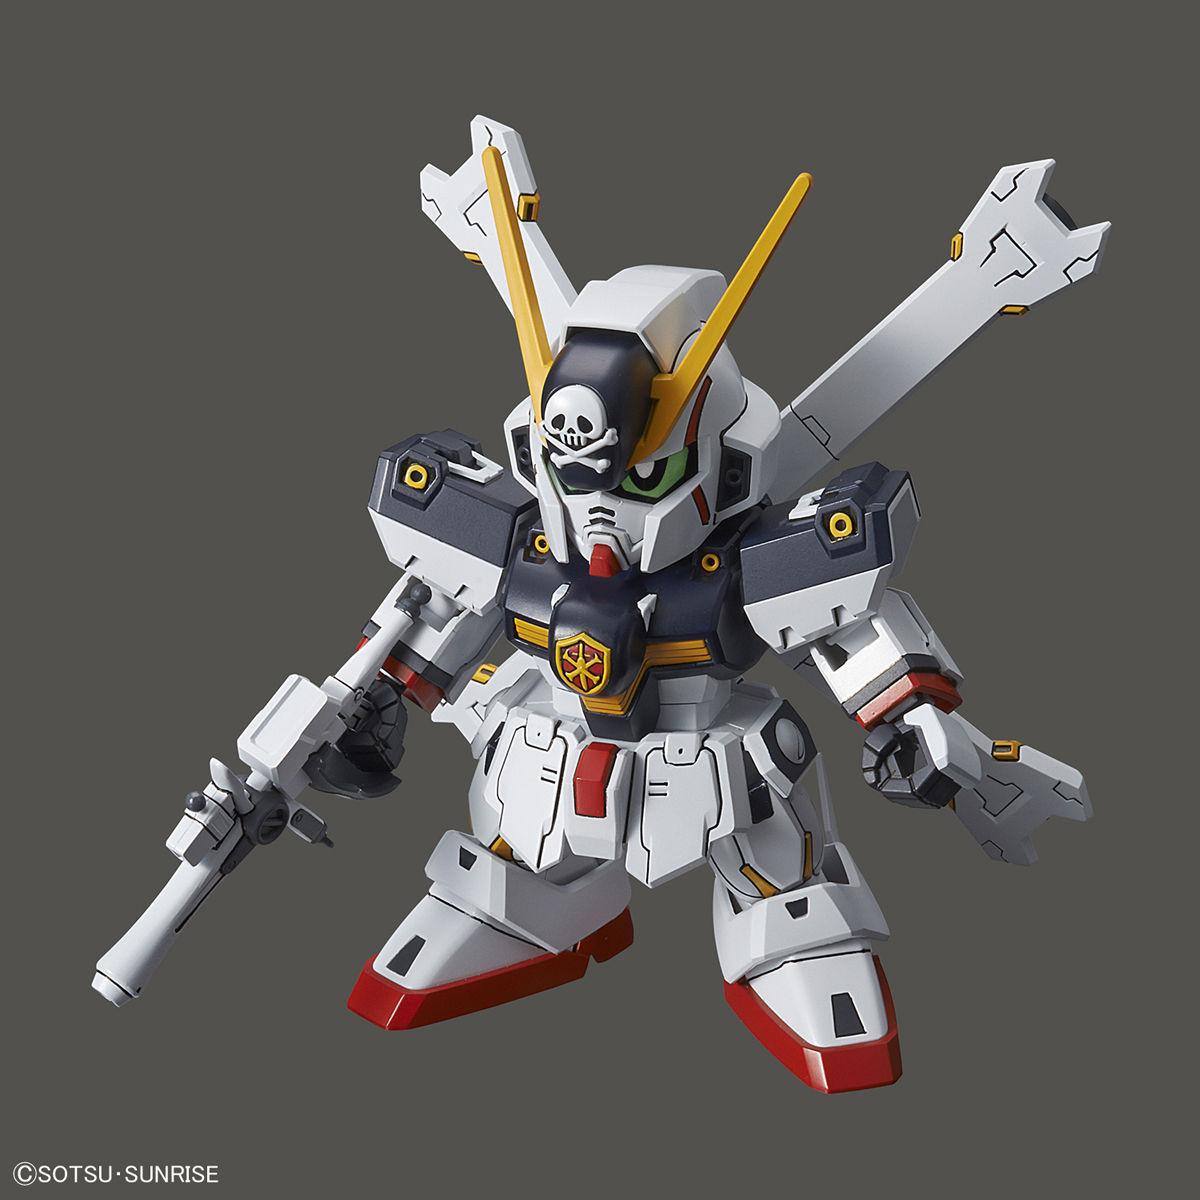 SDガンダム クロスシルエット(SDCS)  003 クロスボーン・ガンダムX1 [SD Gundam Cross Silhouette Crossbone Gundam]